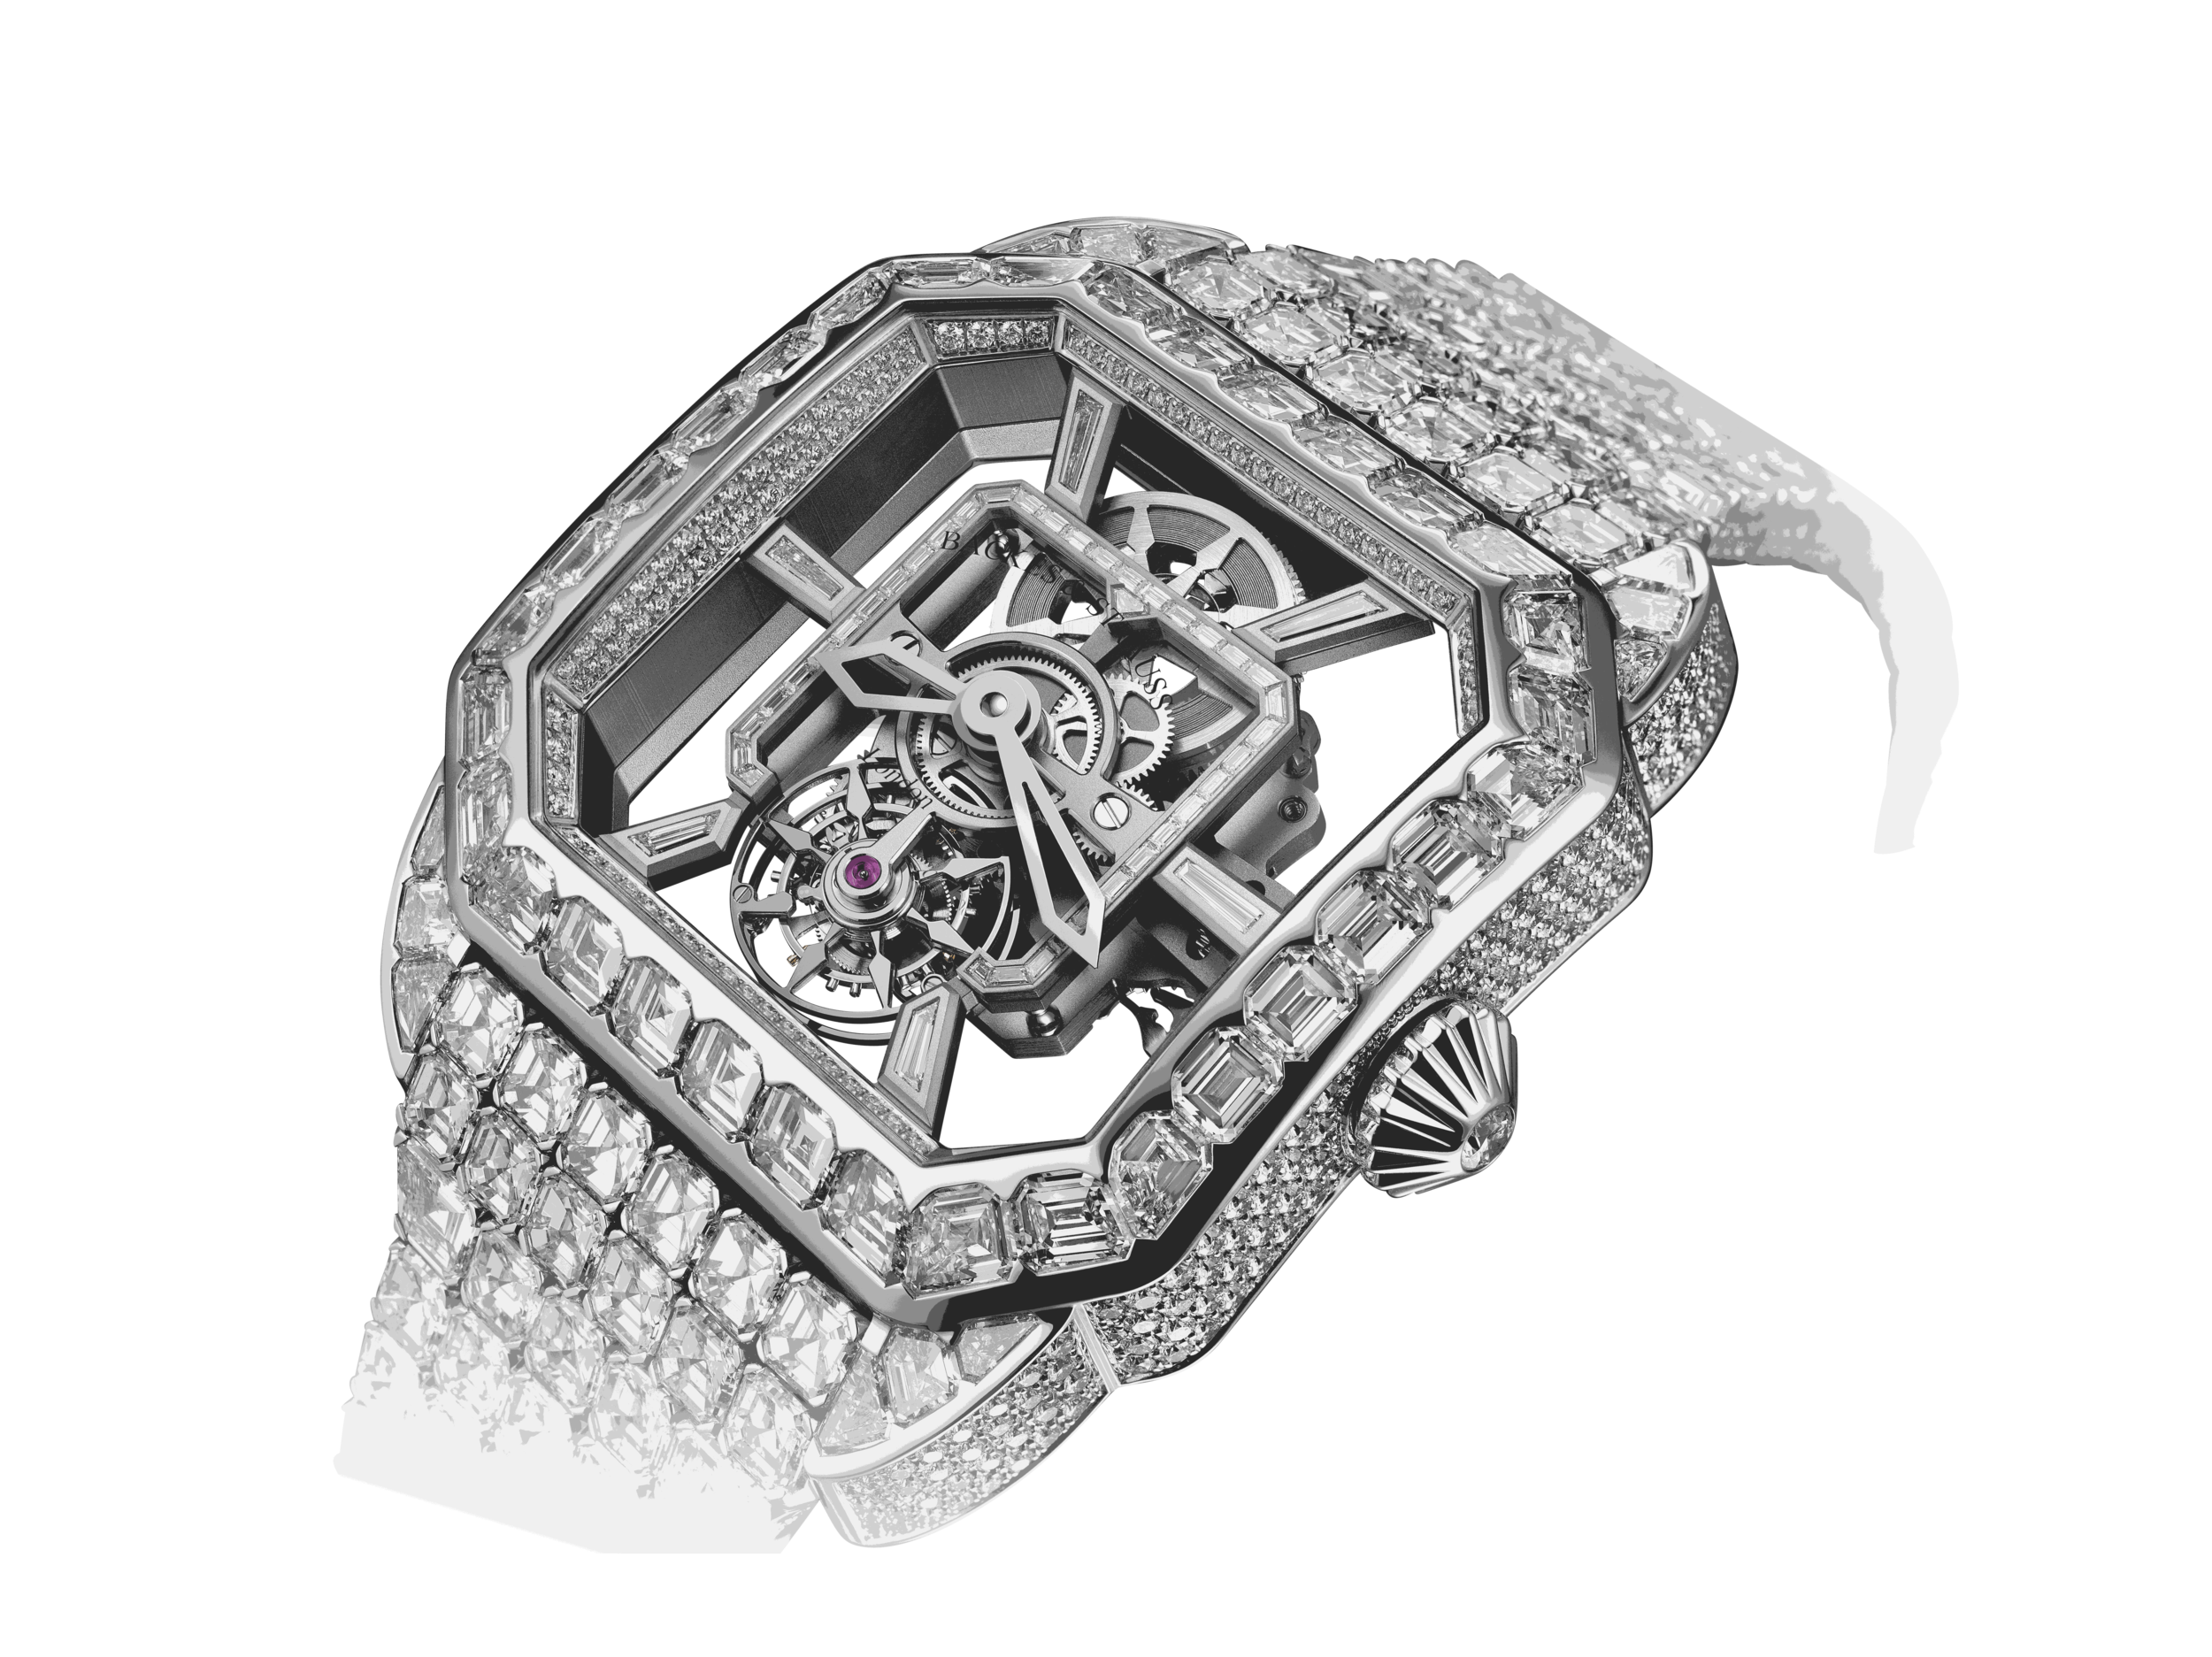 Royal Berkeley Tourbillon 45 diamond watch side-shot